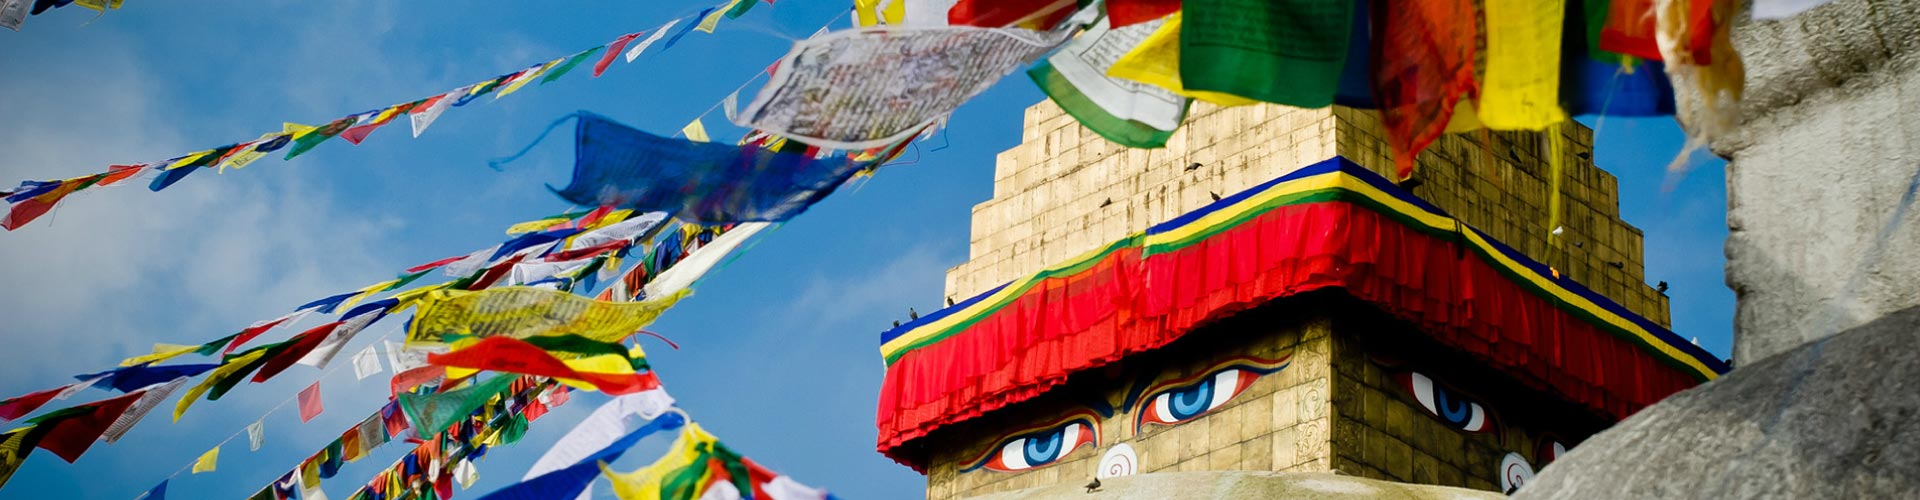 Popular Nepal Tour